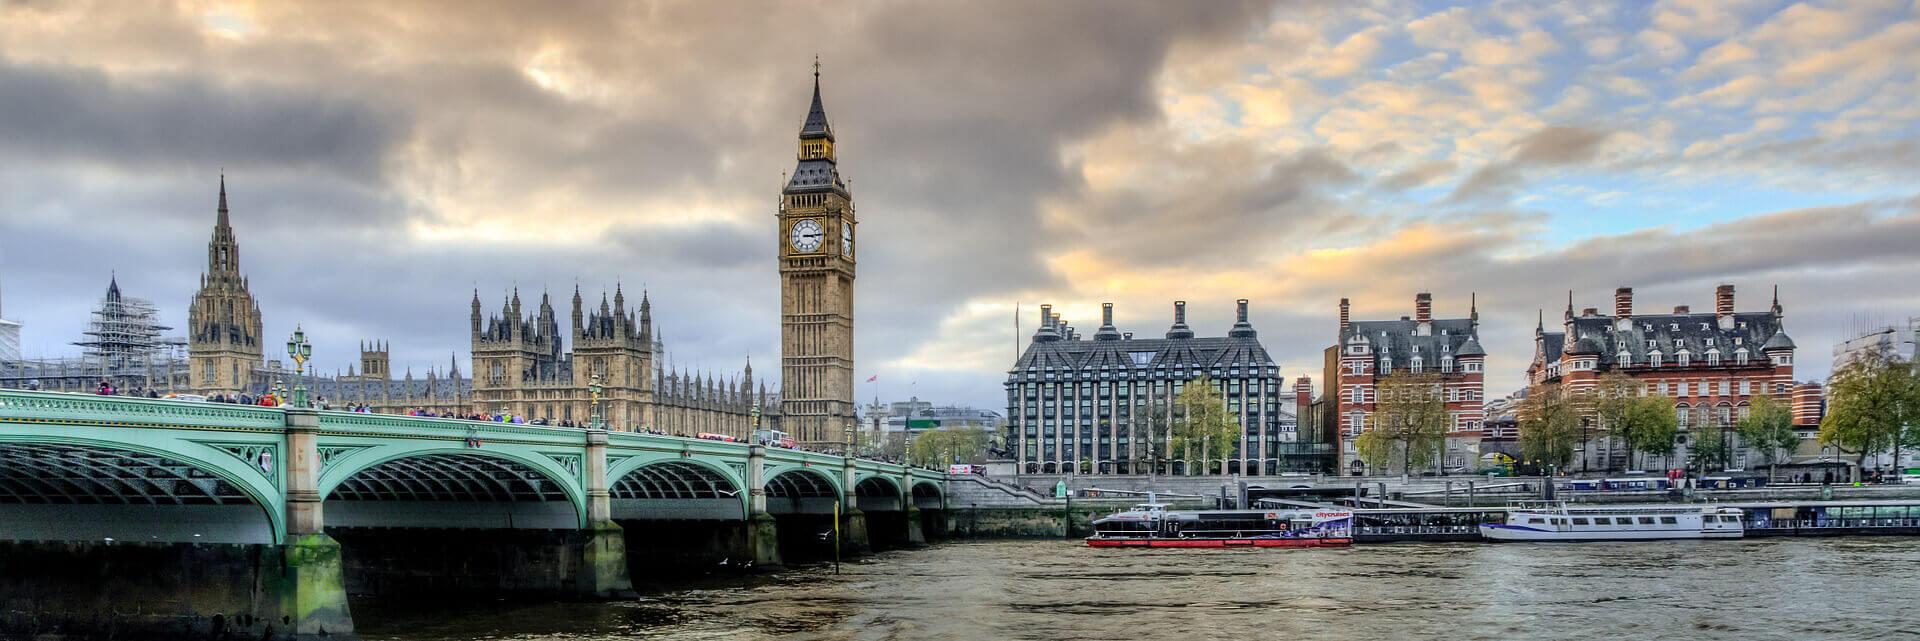 londyn_fedezu_6d20a18032dc86ed333dbe37a23bfe1d